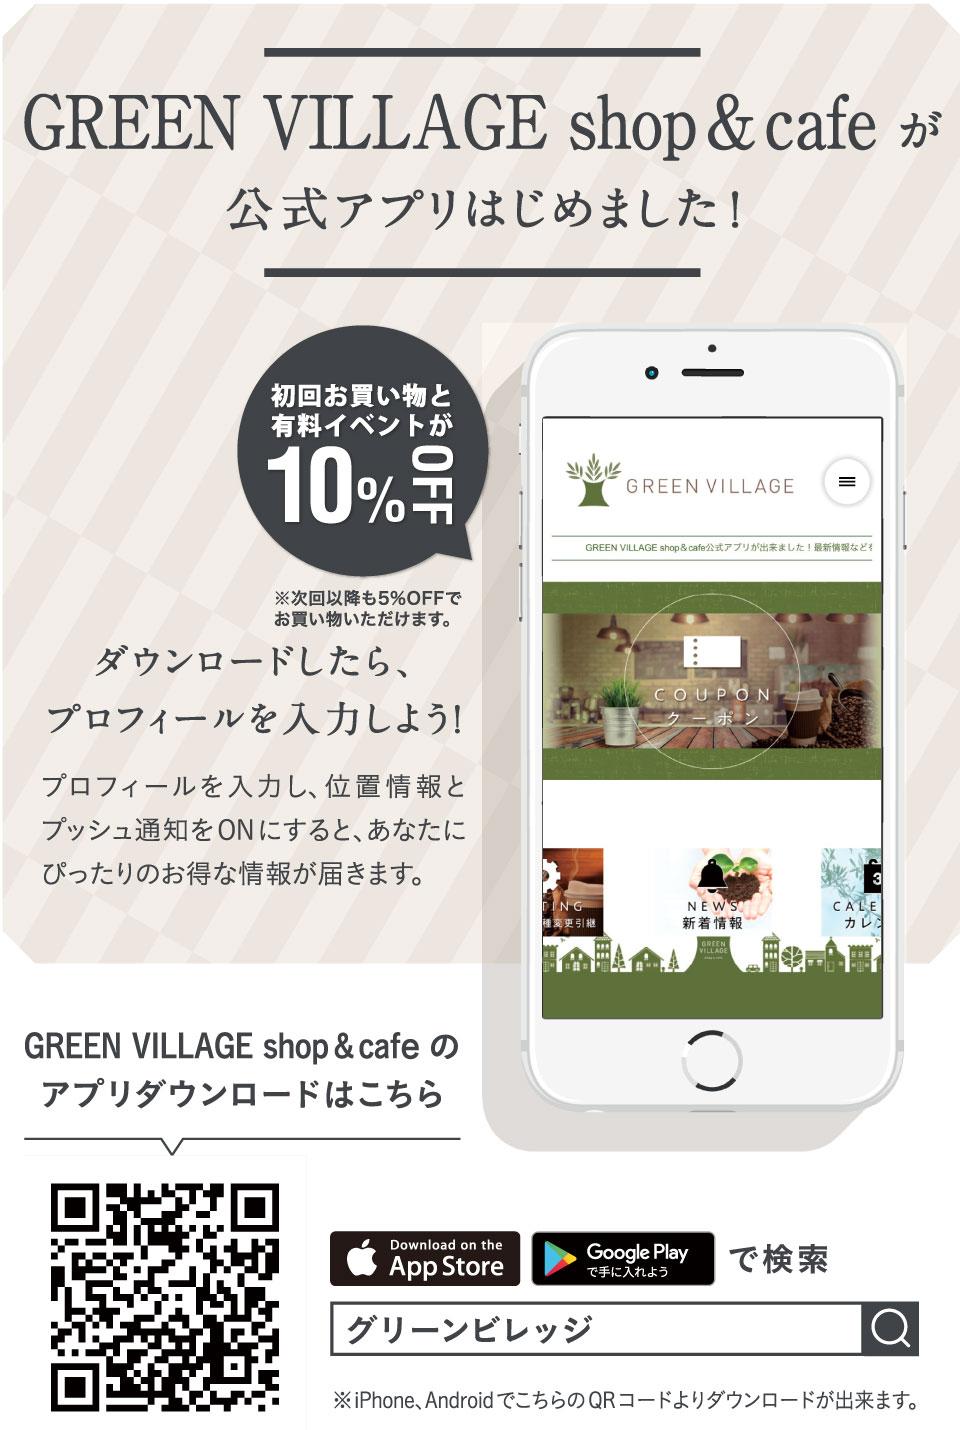 GREEN VILLAGE グリーンビレッジ 公式アプリ